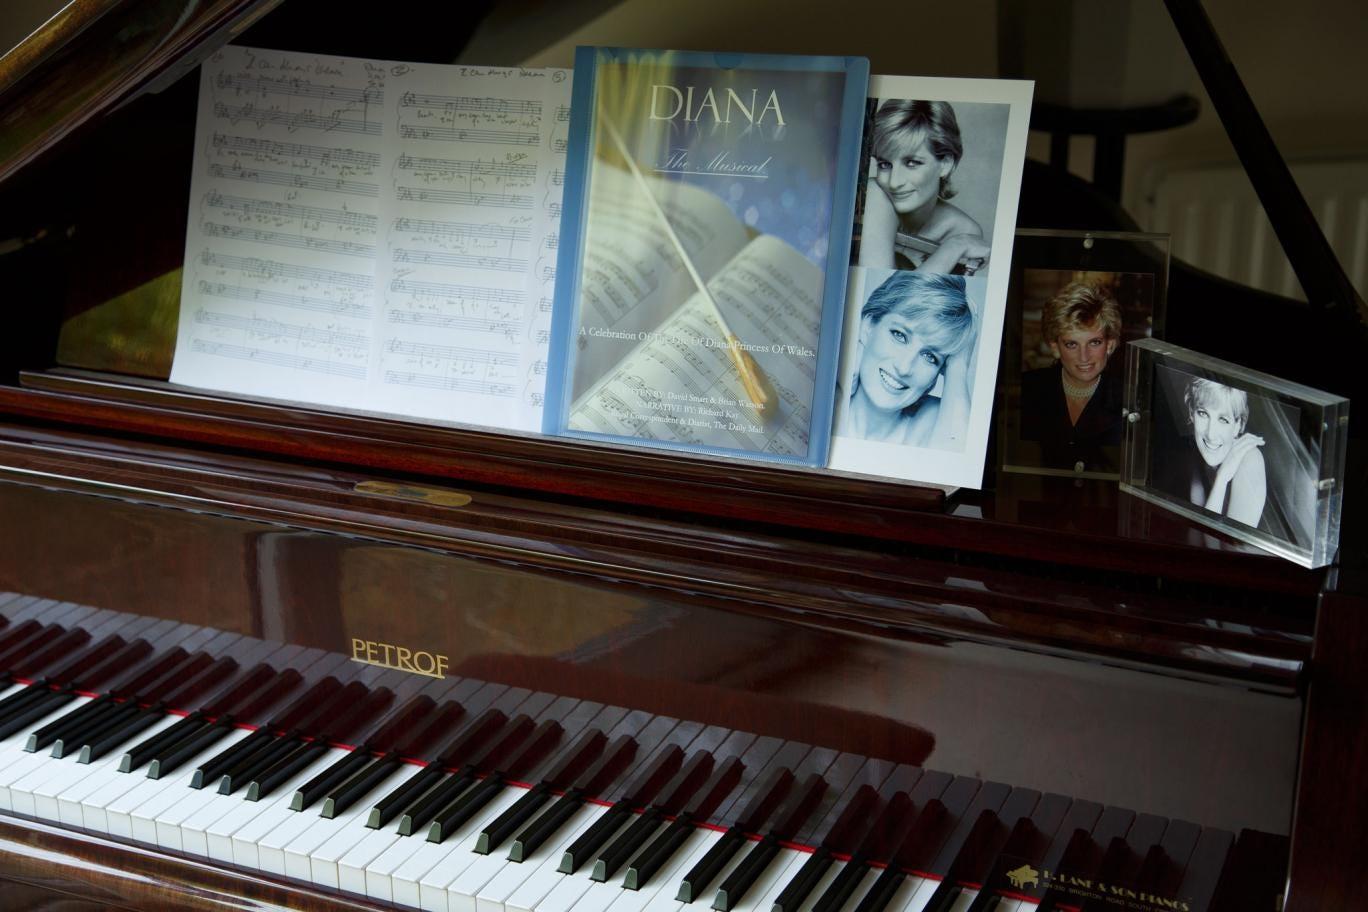 Diana paraphernalia owned by David Smart and Brian Watson